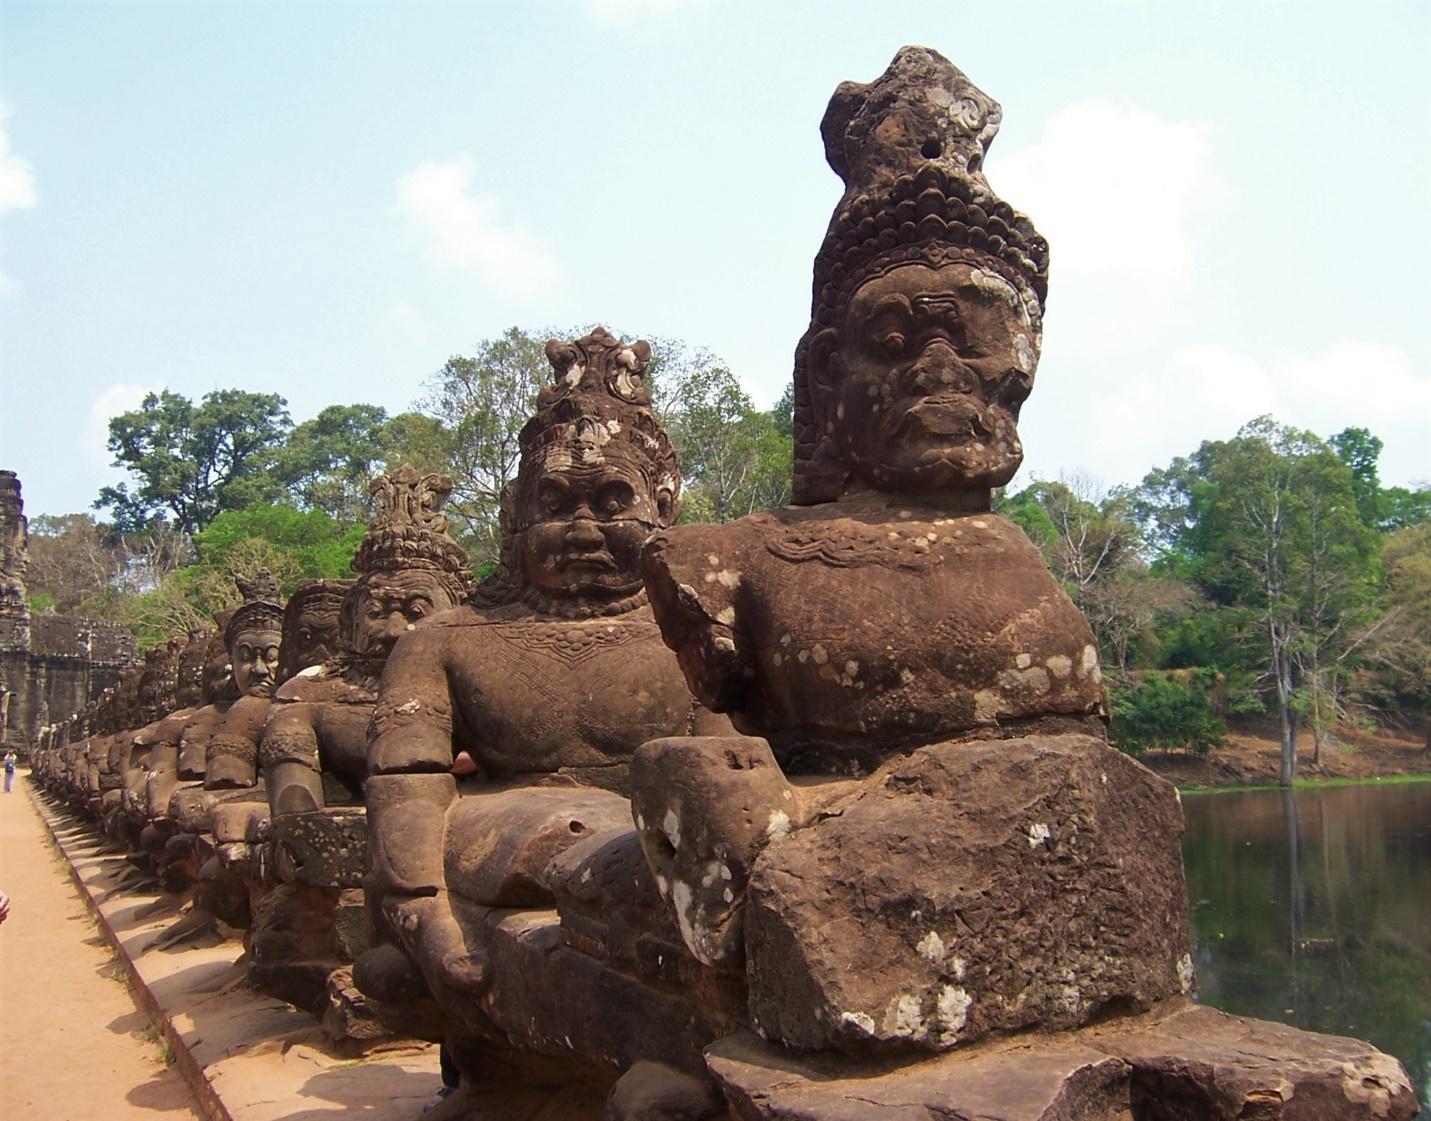 Angkor Thom's Victory Gate